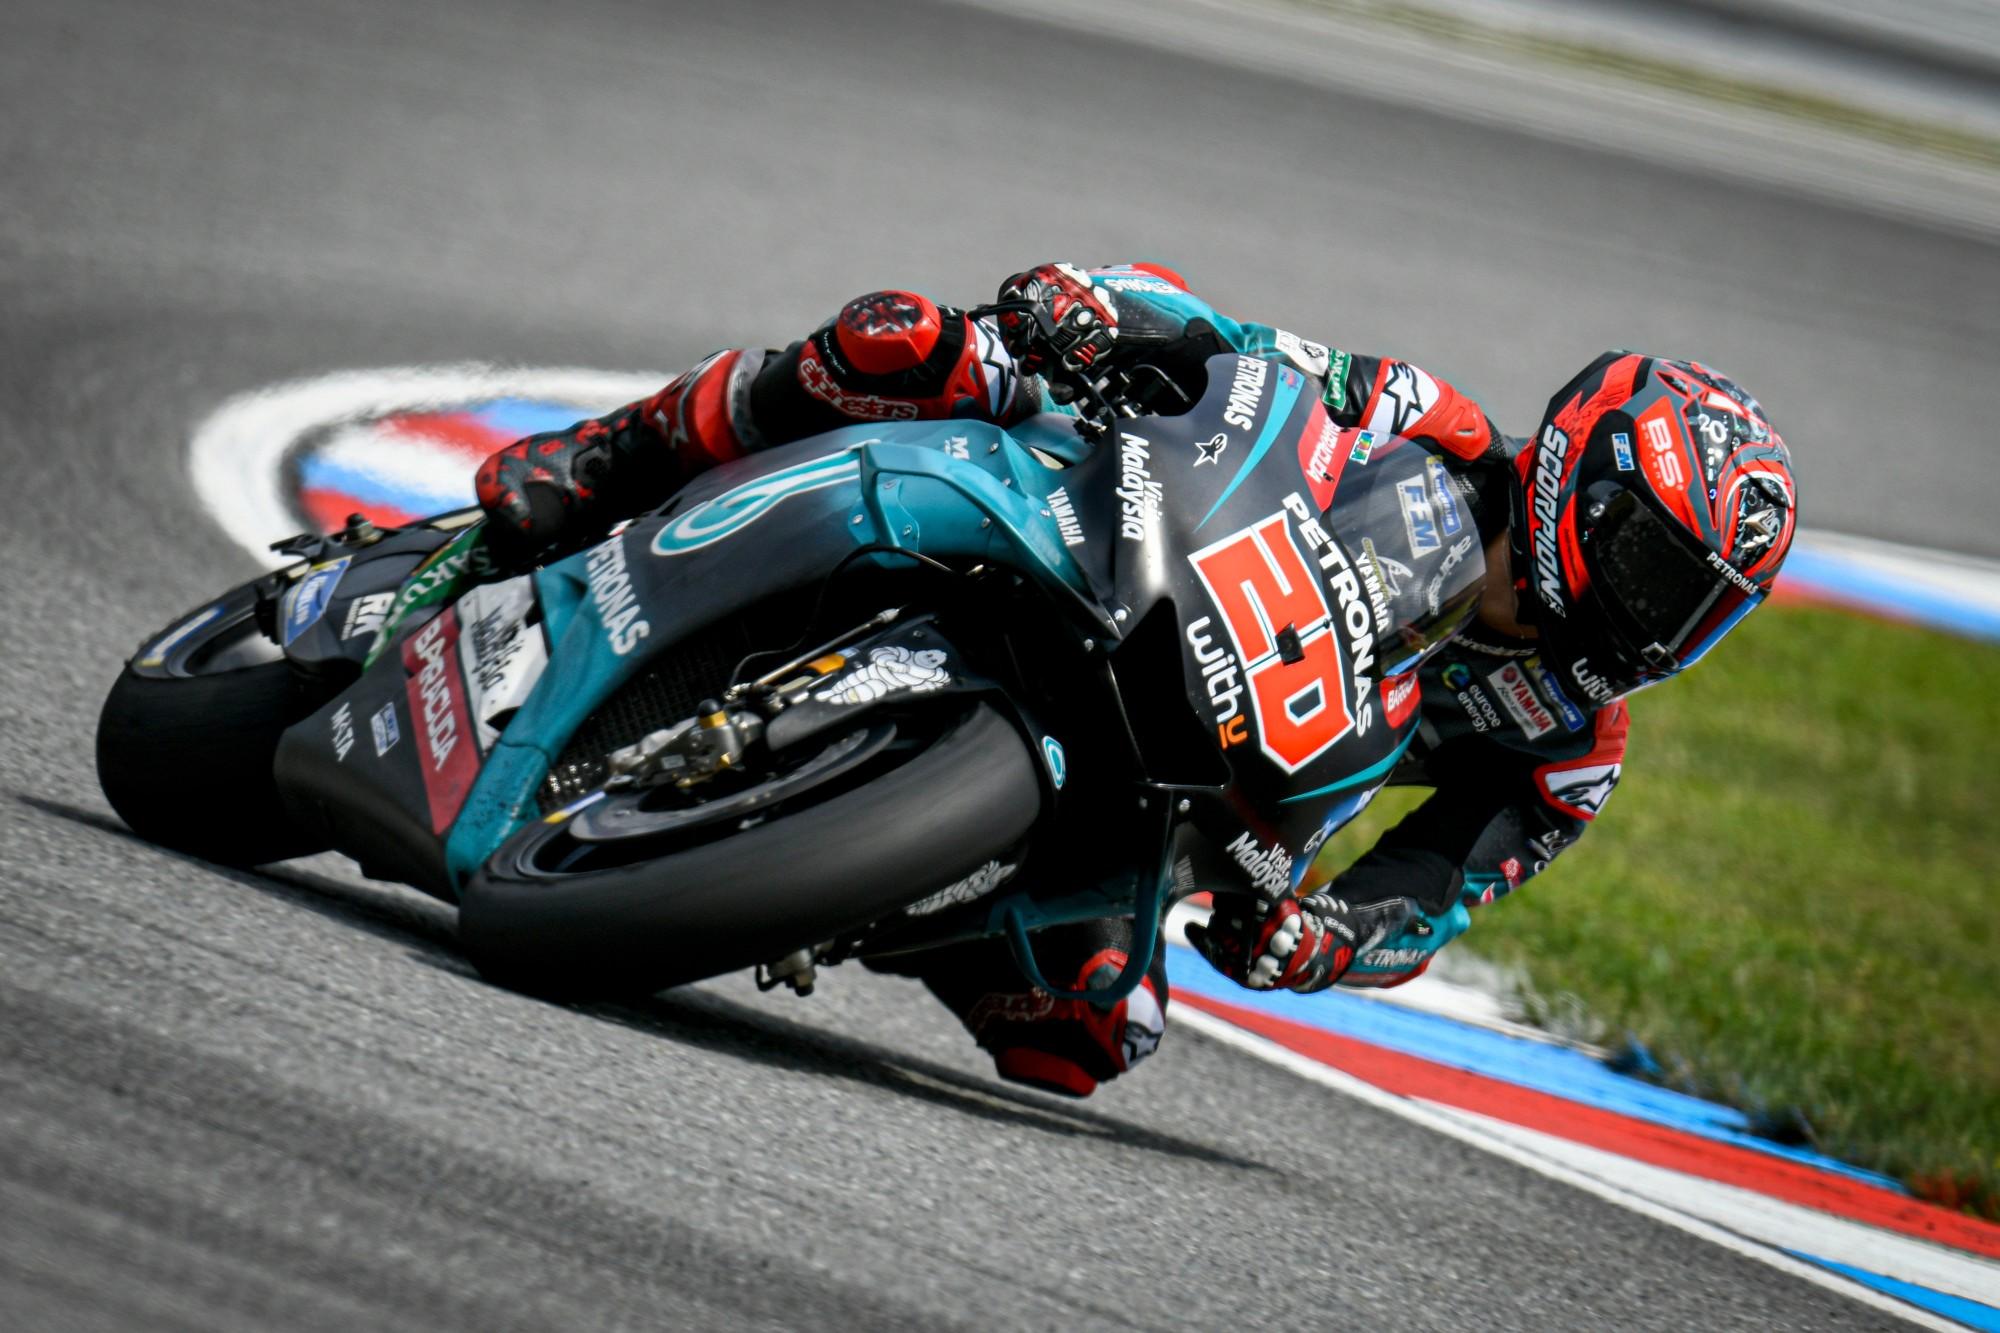 Motogp Fabio Quartararo Fastest New Yamahas Break Cover During Testing Monday At Brno Roadracing World Magazine Motorcycle Riding Racing Tech News